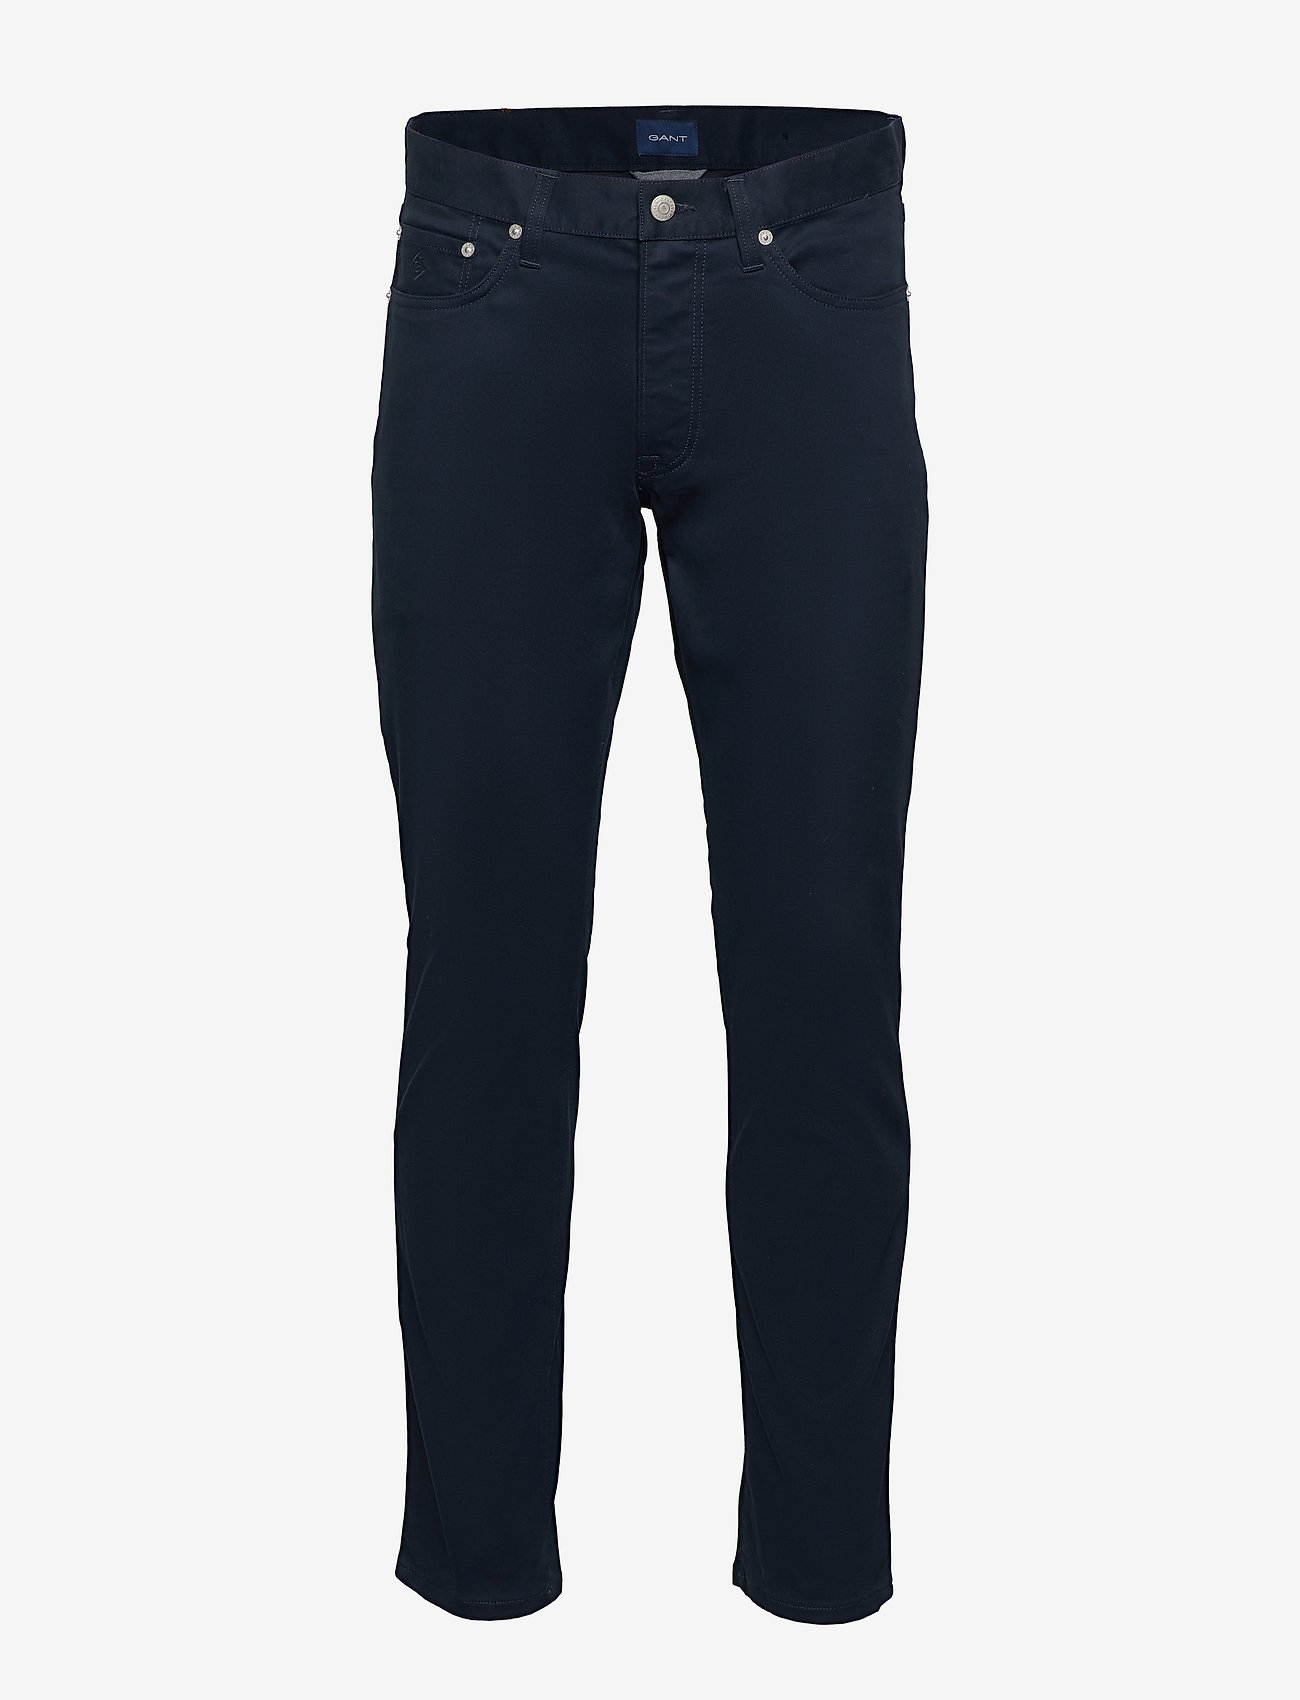 GANT - D1. TP SLIM BEDFORD JEANS - slim jeans - navy - 1